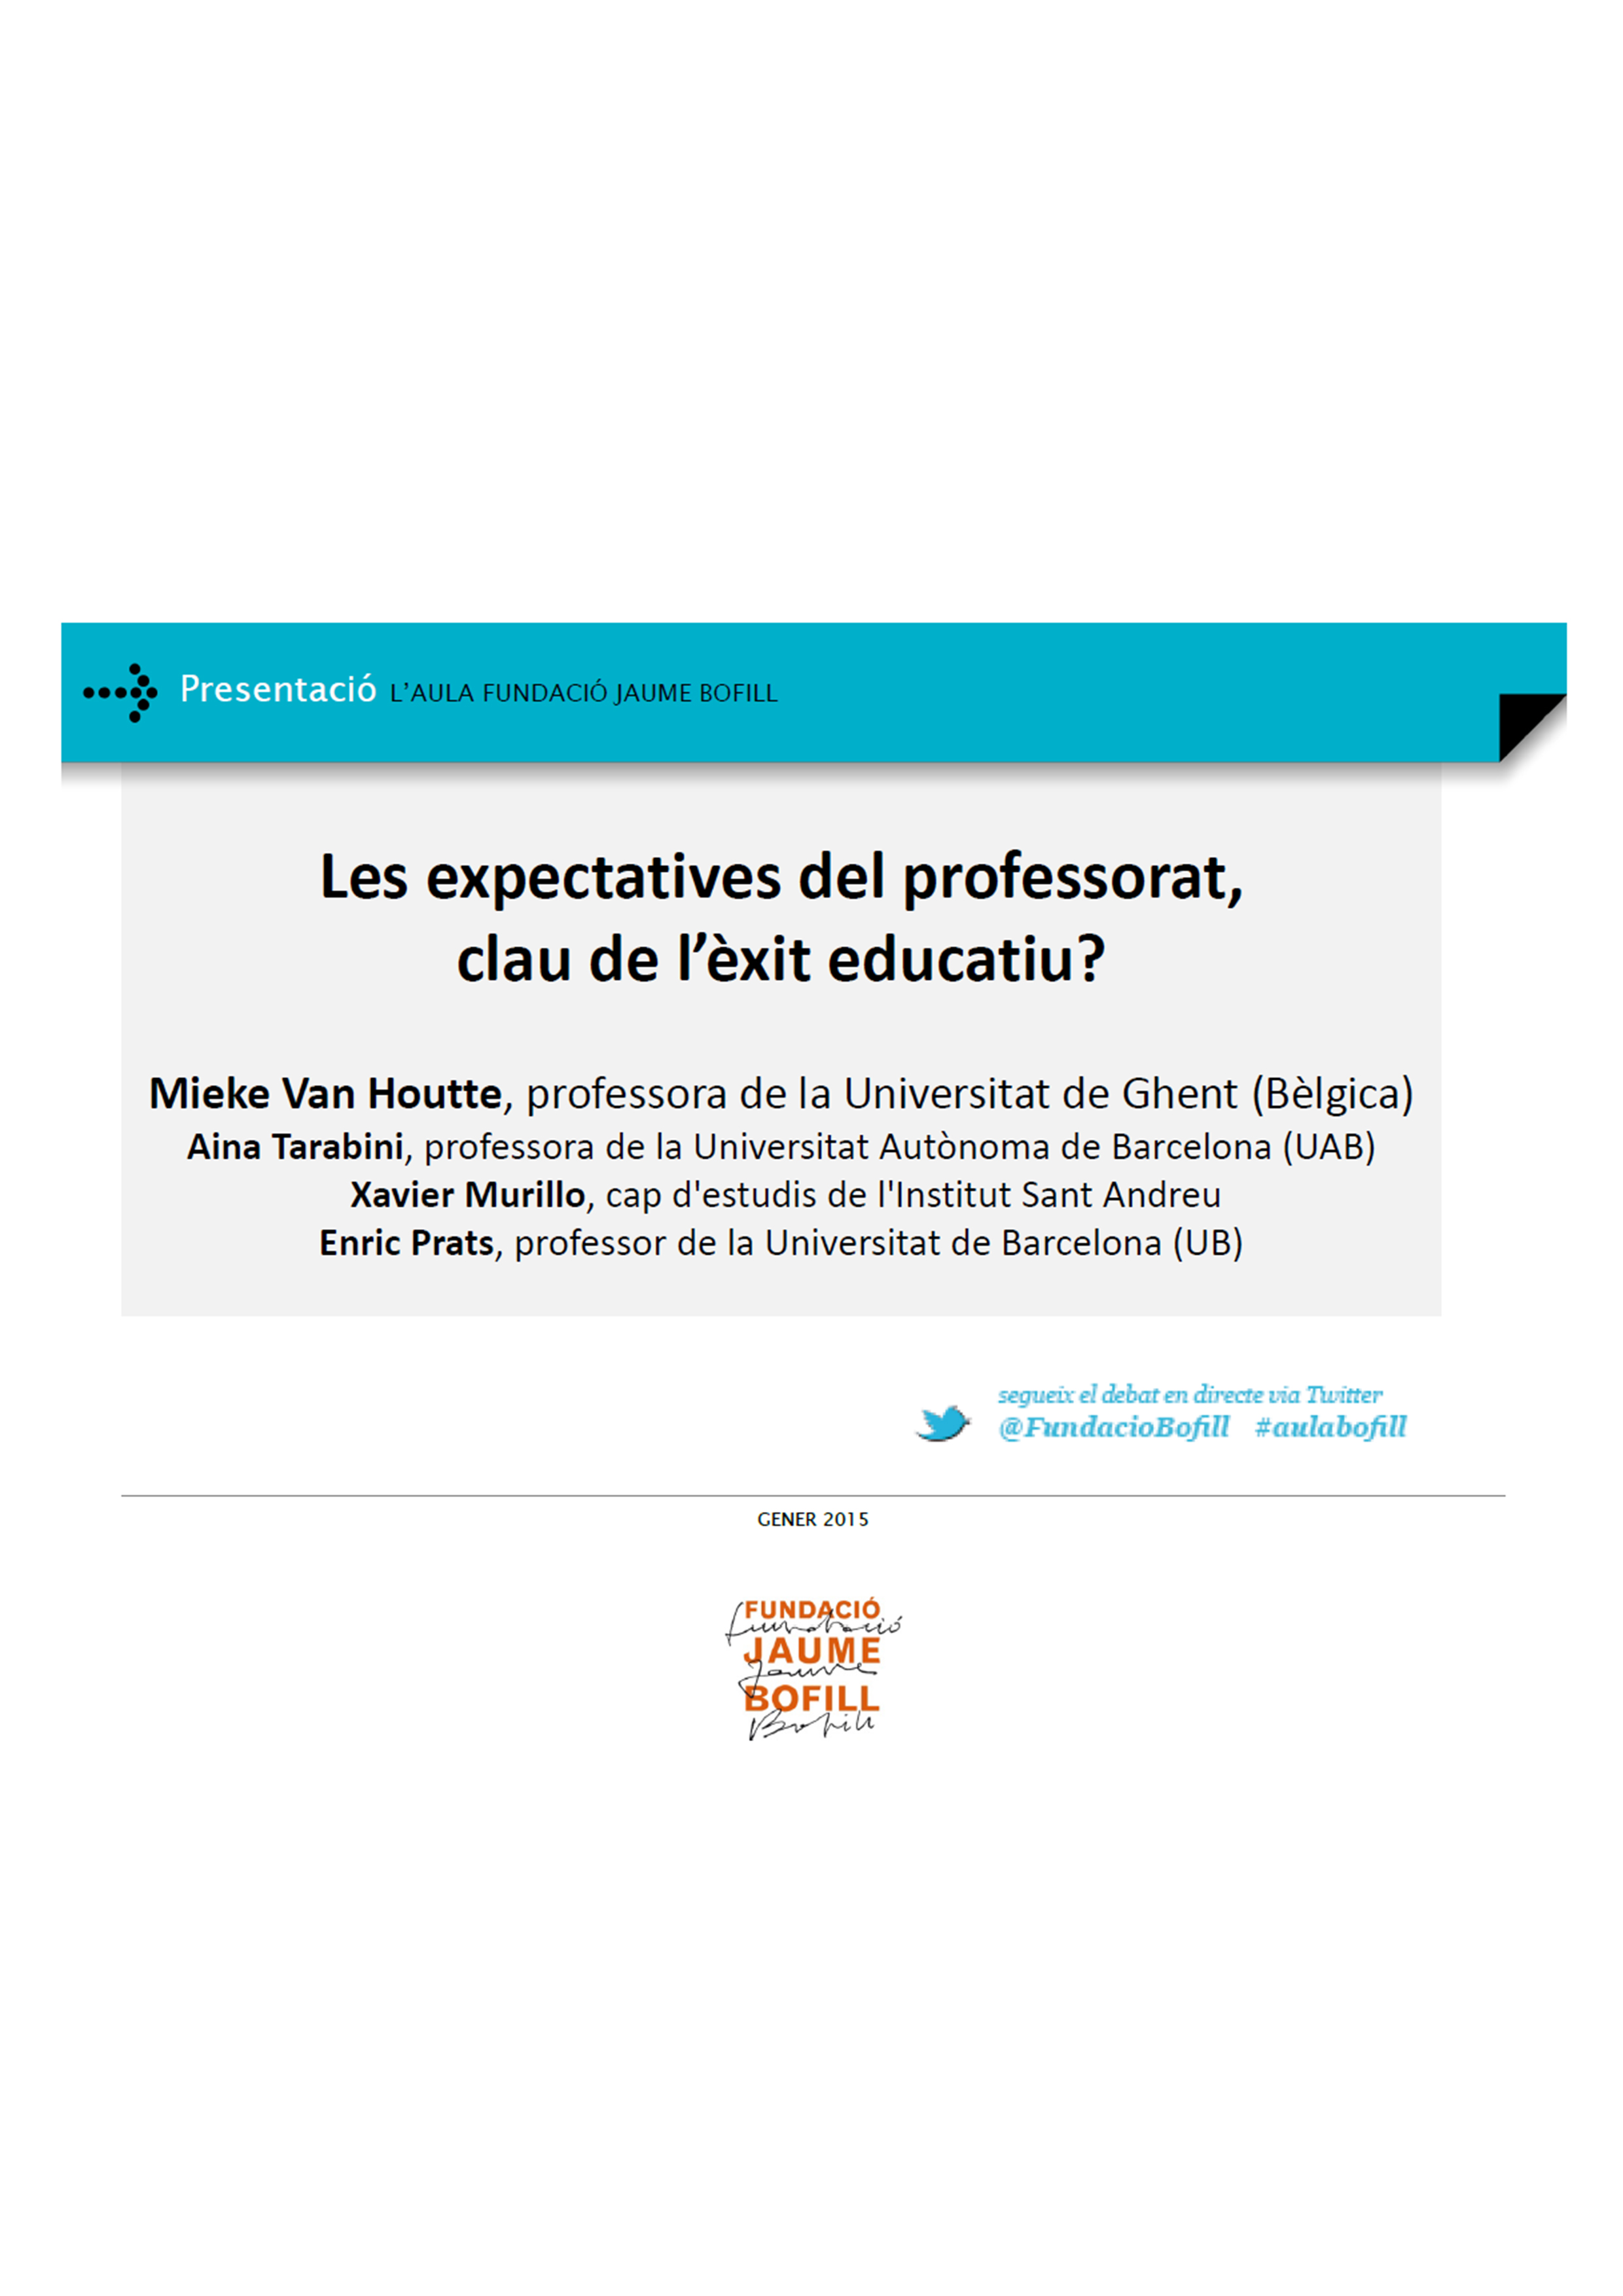 presentaciopp_lesexpectativesdelprofessorat.jpg